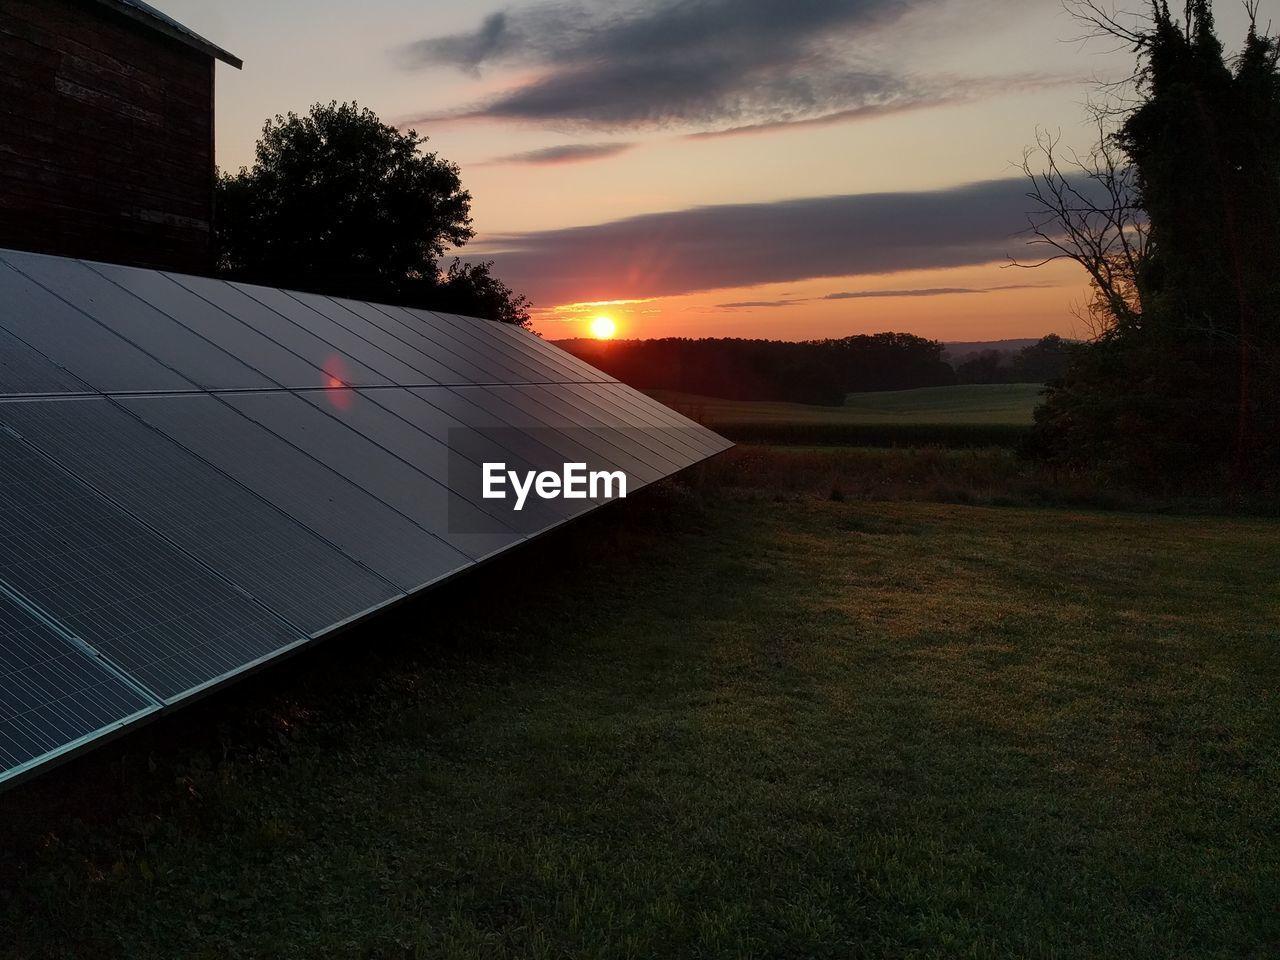 sunset, sun, solar energy, solar panel, sky, nature, cloud - sky, tree, grass, outdoors, no people, alternative energy, beauty in nature, scenics, solar equipment, day